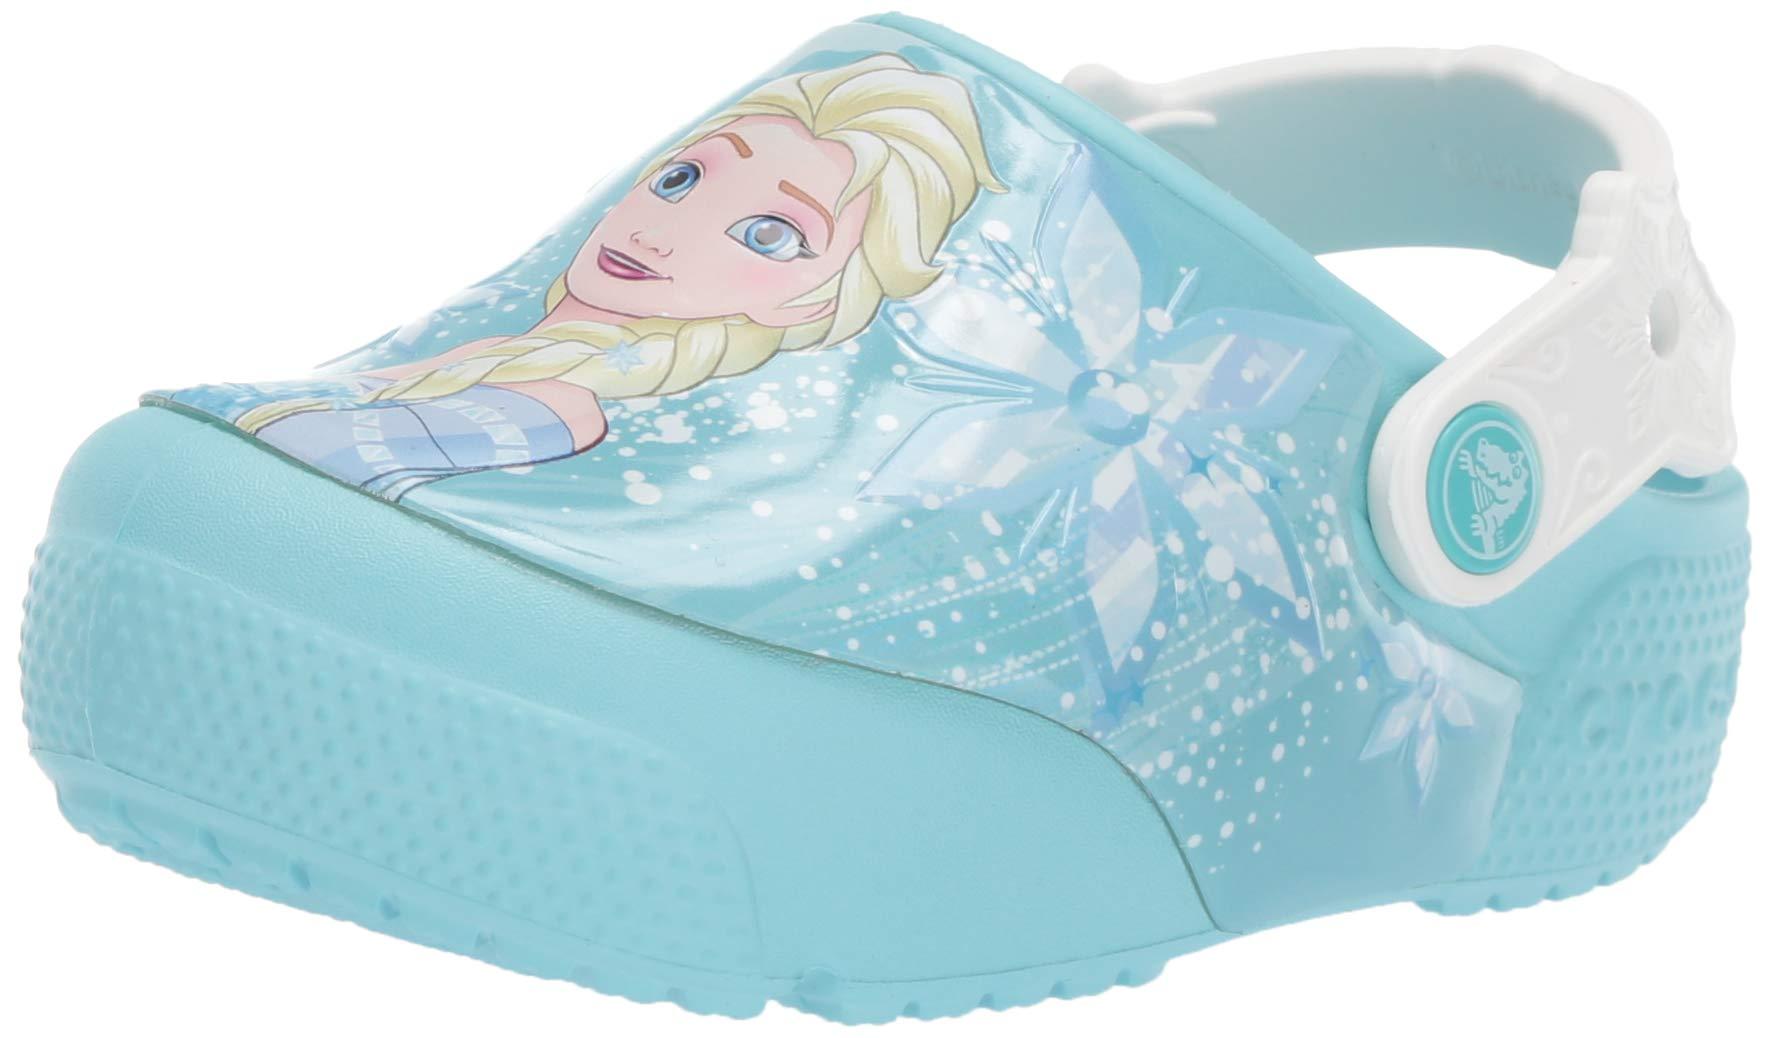 Crocs Kids' Fun Lab Frozen Elsa Light-Up Clog, Ice Blue, 12 M US Little Kid